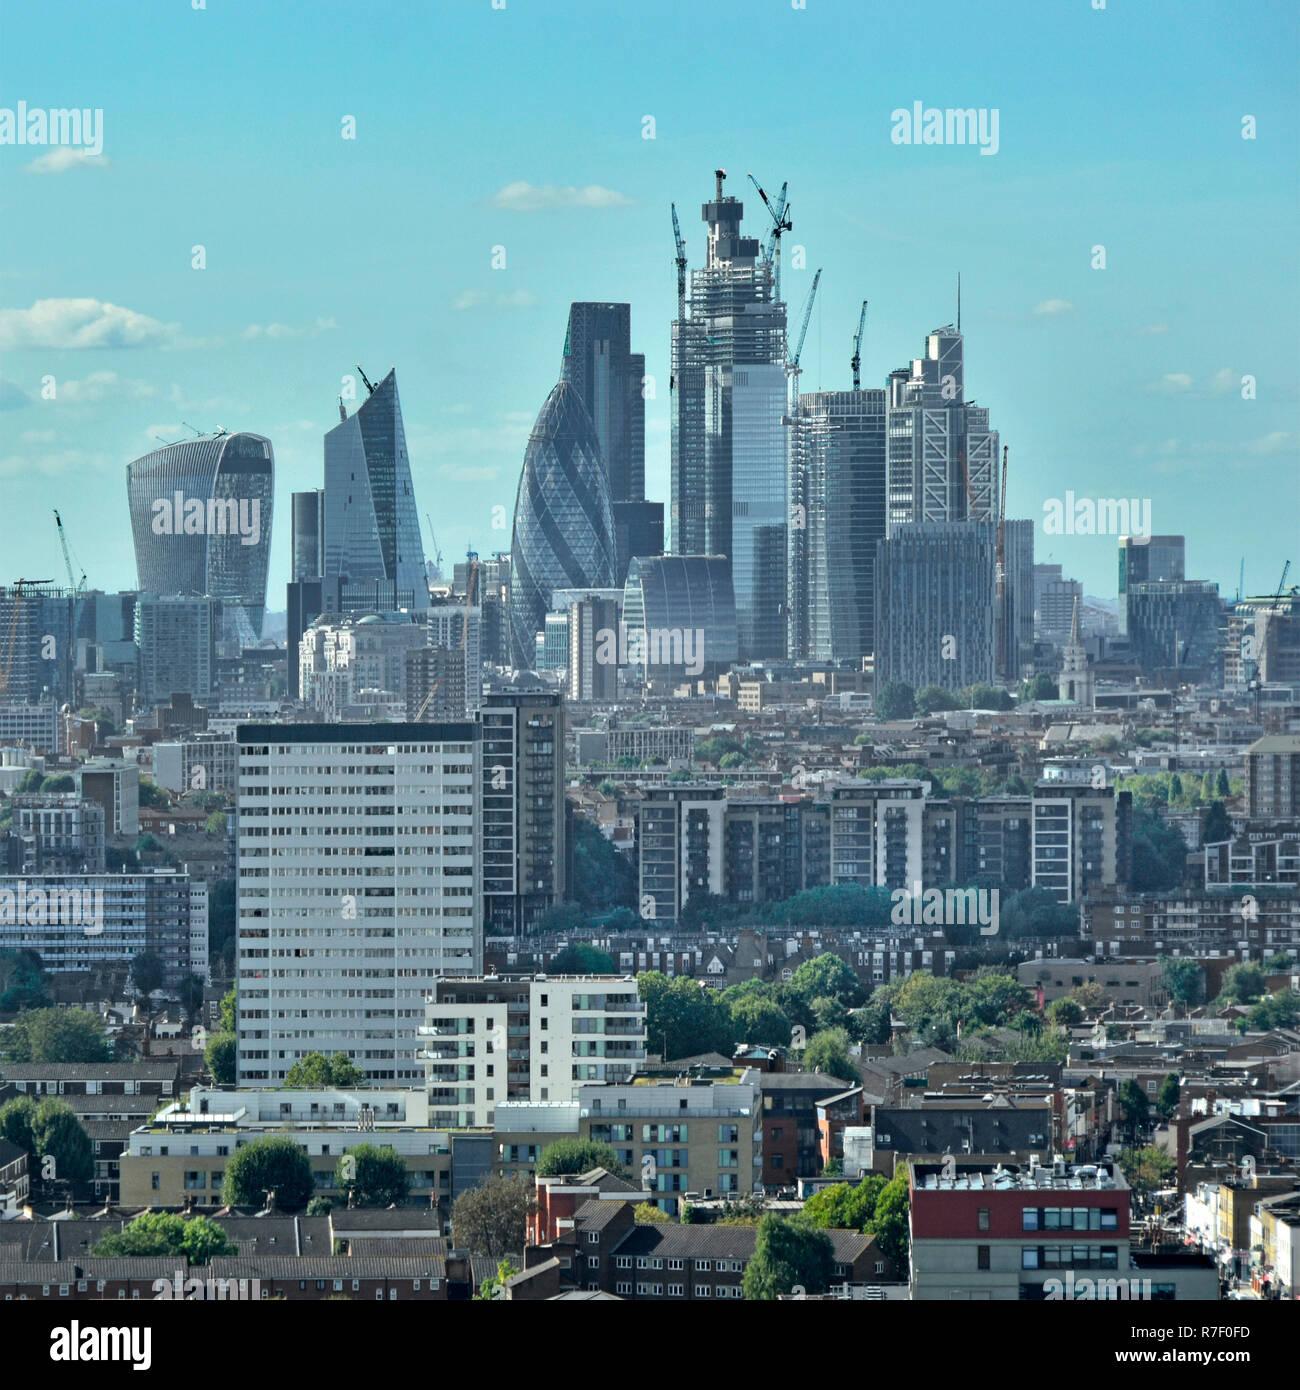 City of London cityscape skyline & landmark skyscraper building construction site work in progress East London urban landscape foreground England UK - Stock Image